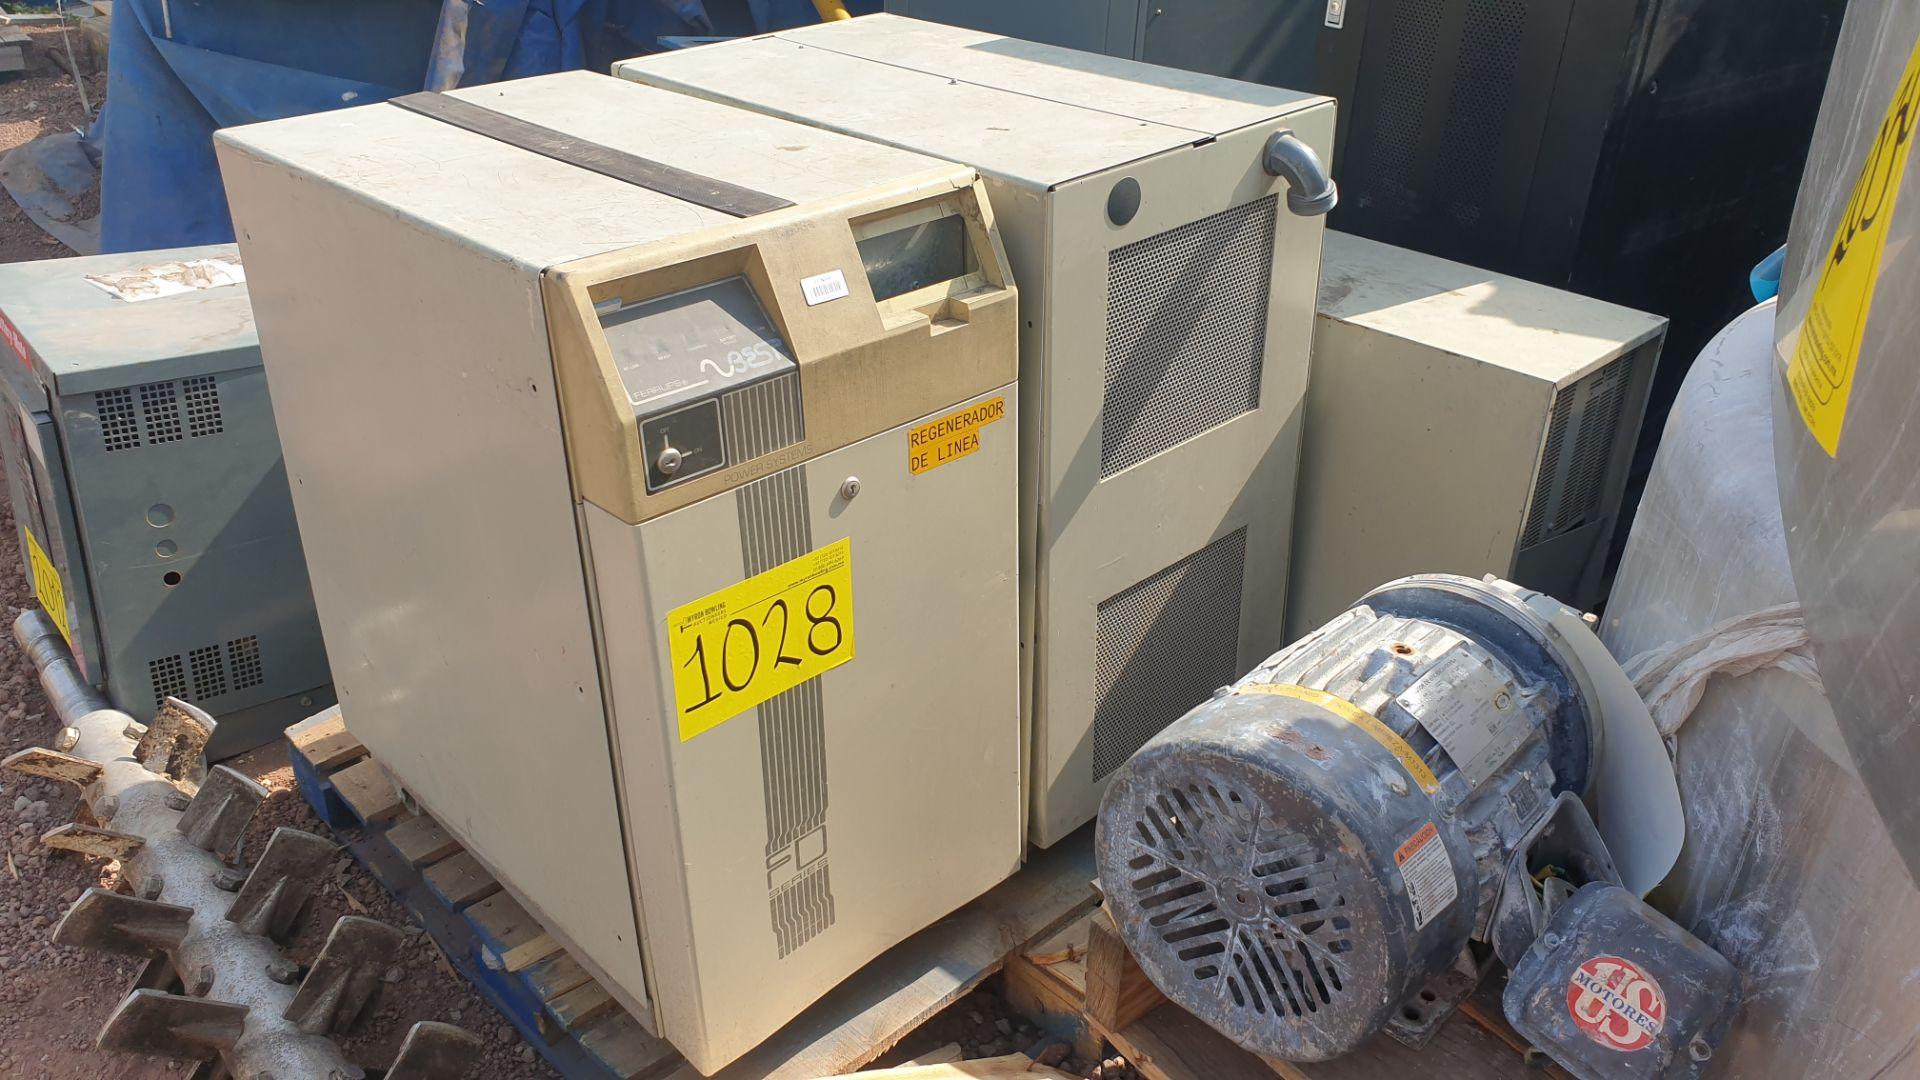 1 Ferrups Power bank system model FD10KVA 208-240V includes Lortec UPS of 3KVA - Image 4 of 11